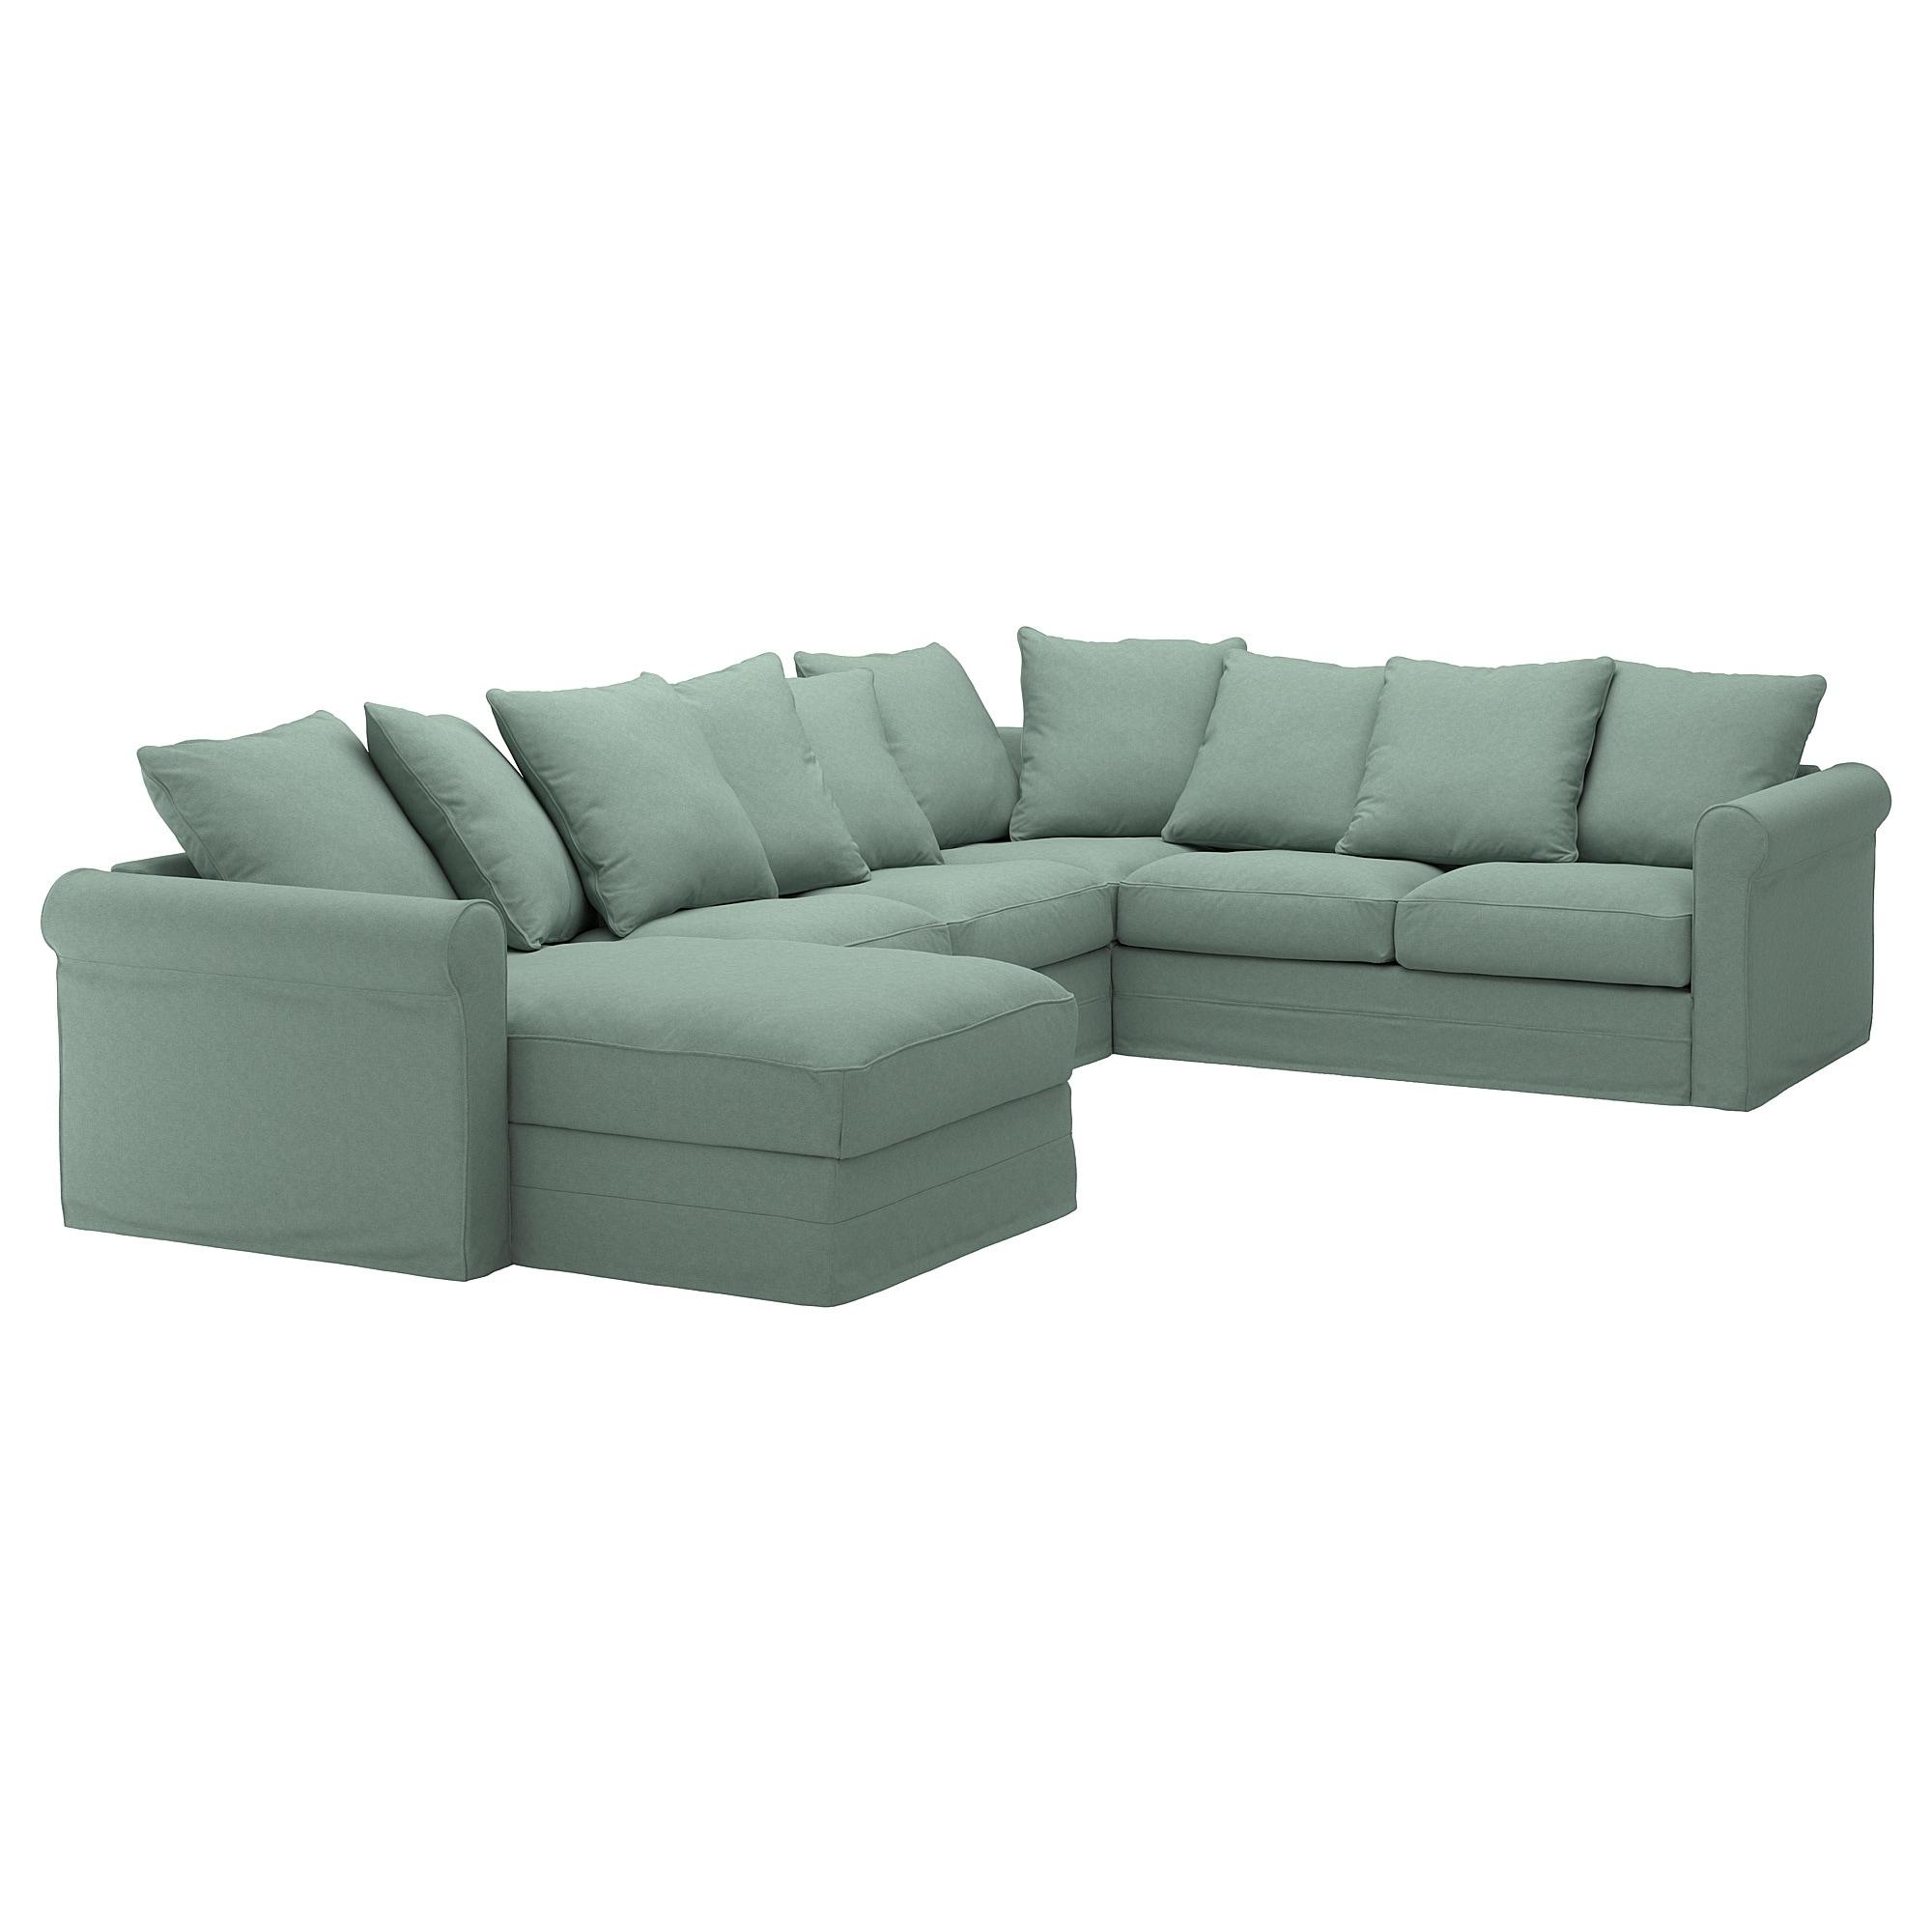 IKEA GRÖNLID corner sofa, 5-seat 10 year guarantee. Read about the terms